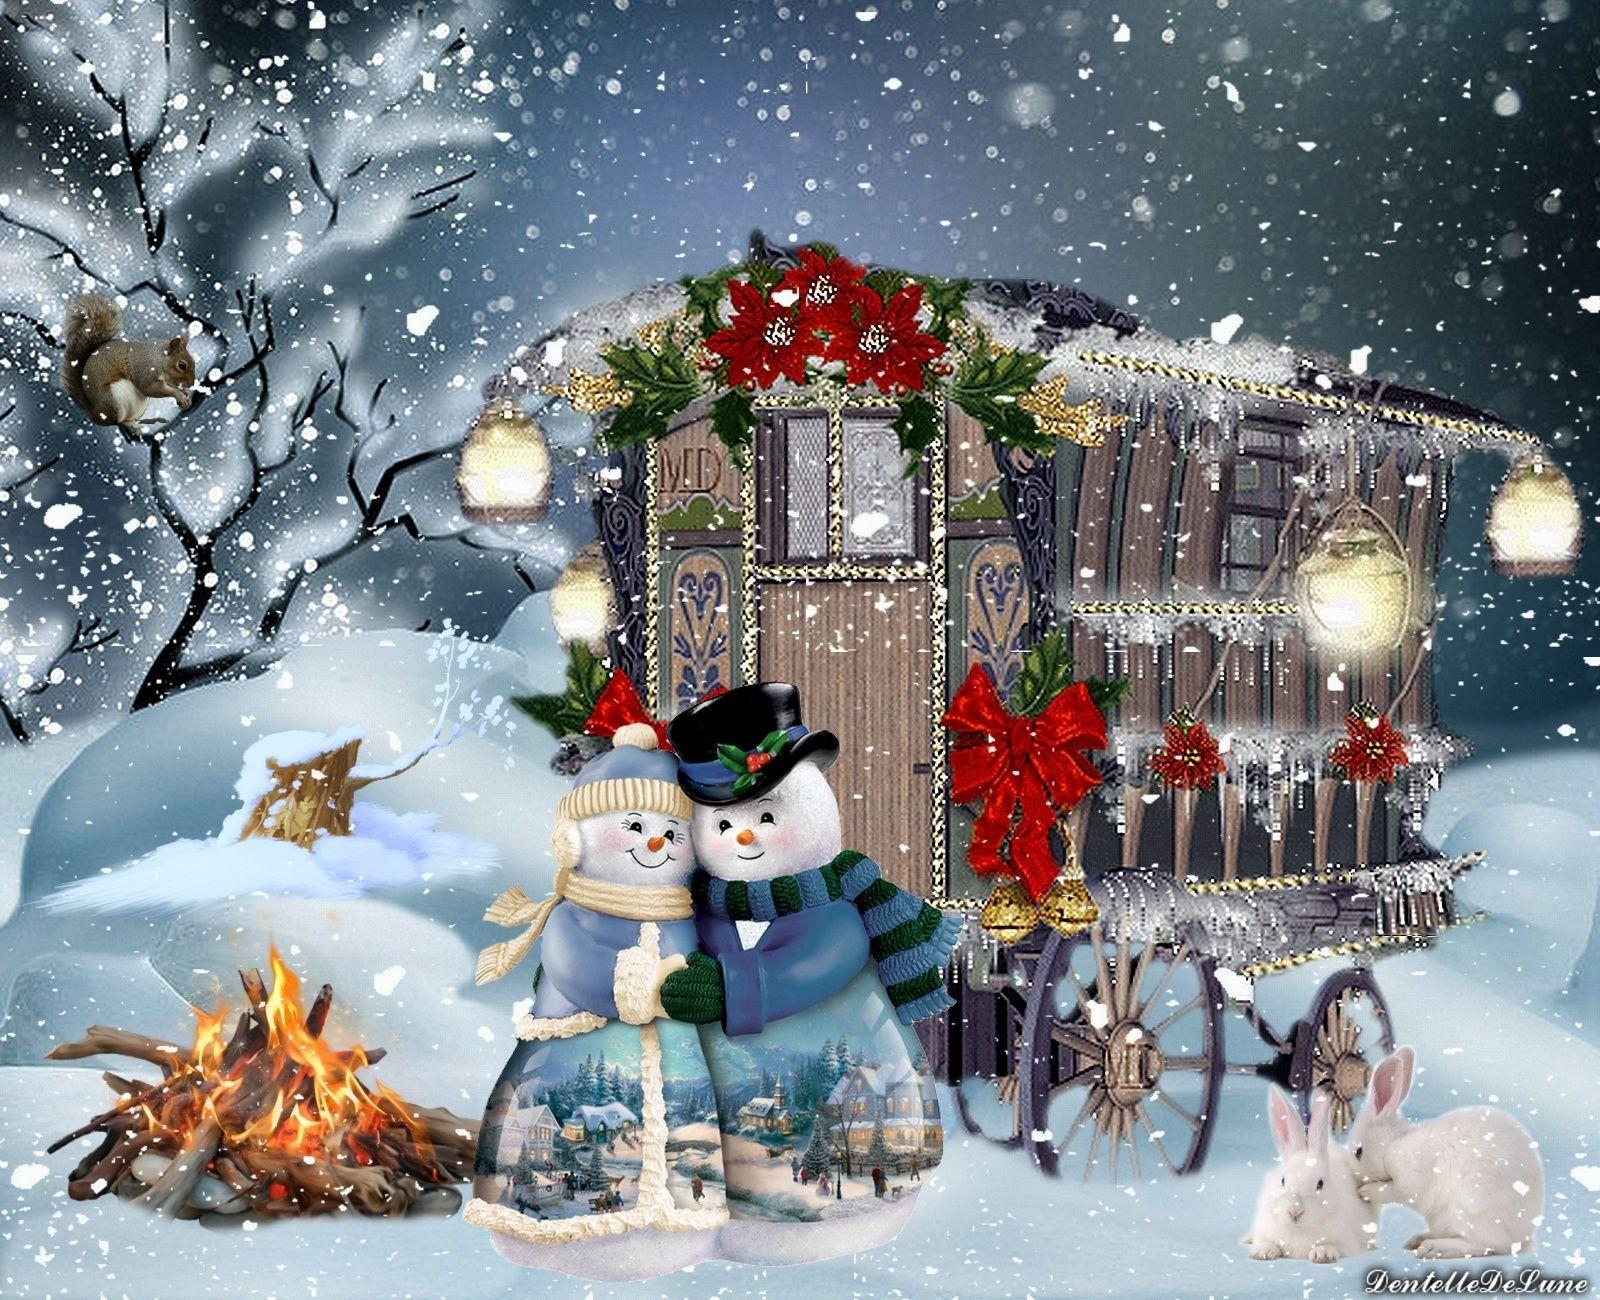 Fond D Ecran Noel Paysage Enneige Roulotte Bonhomme De Neige Gif Anime Joyeux Noel Roulotte Scintill Images De Noel Anciennes Paysage Enneige Fond Ecran Noel